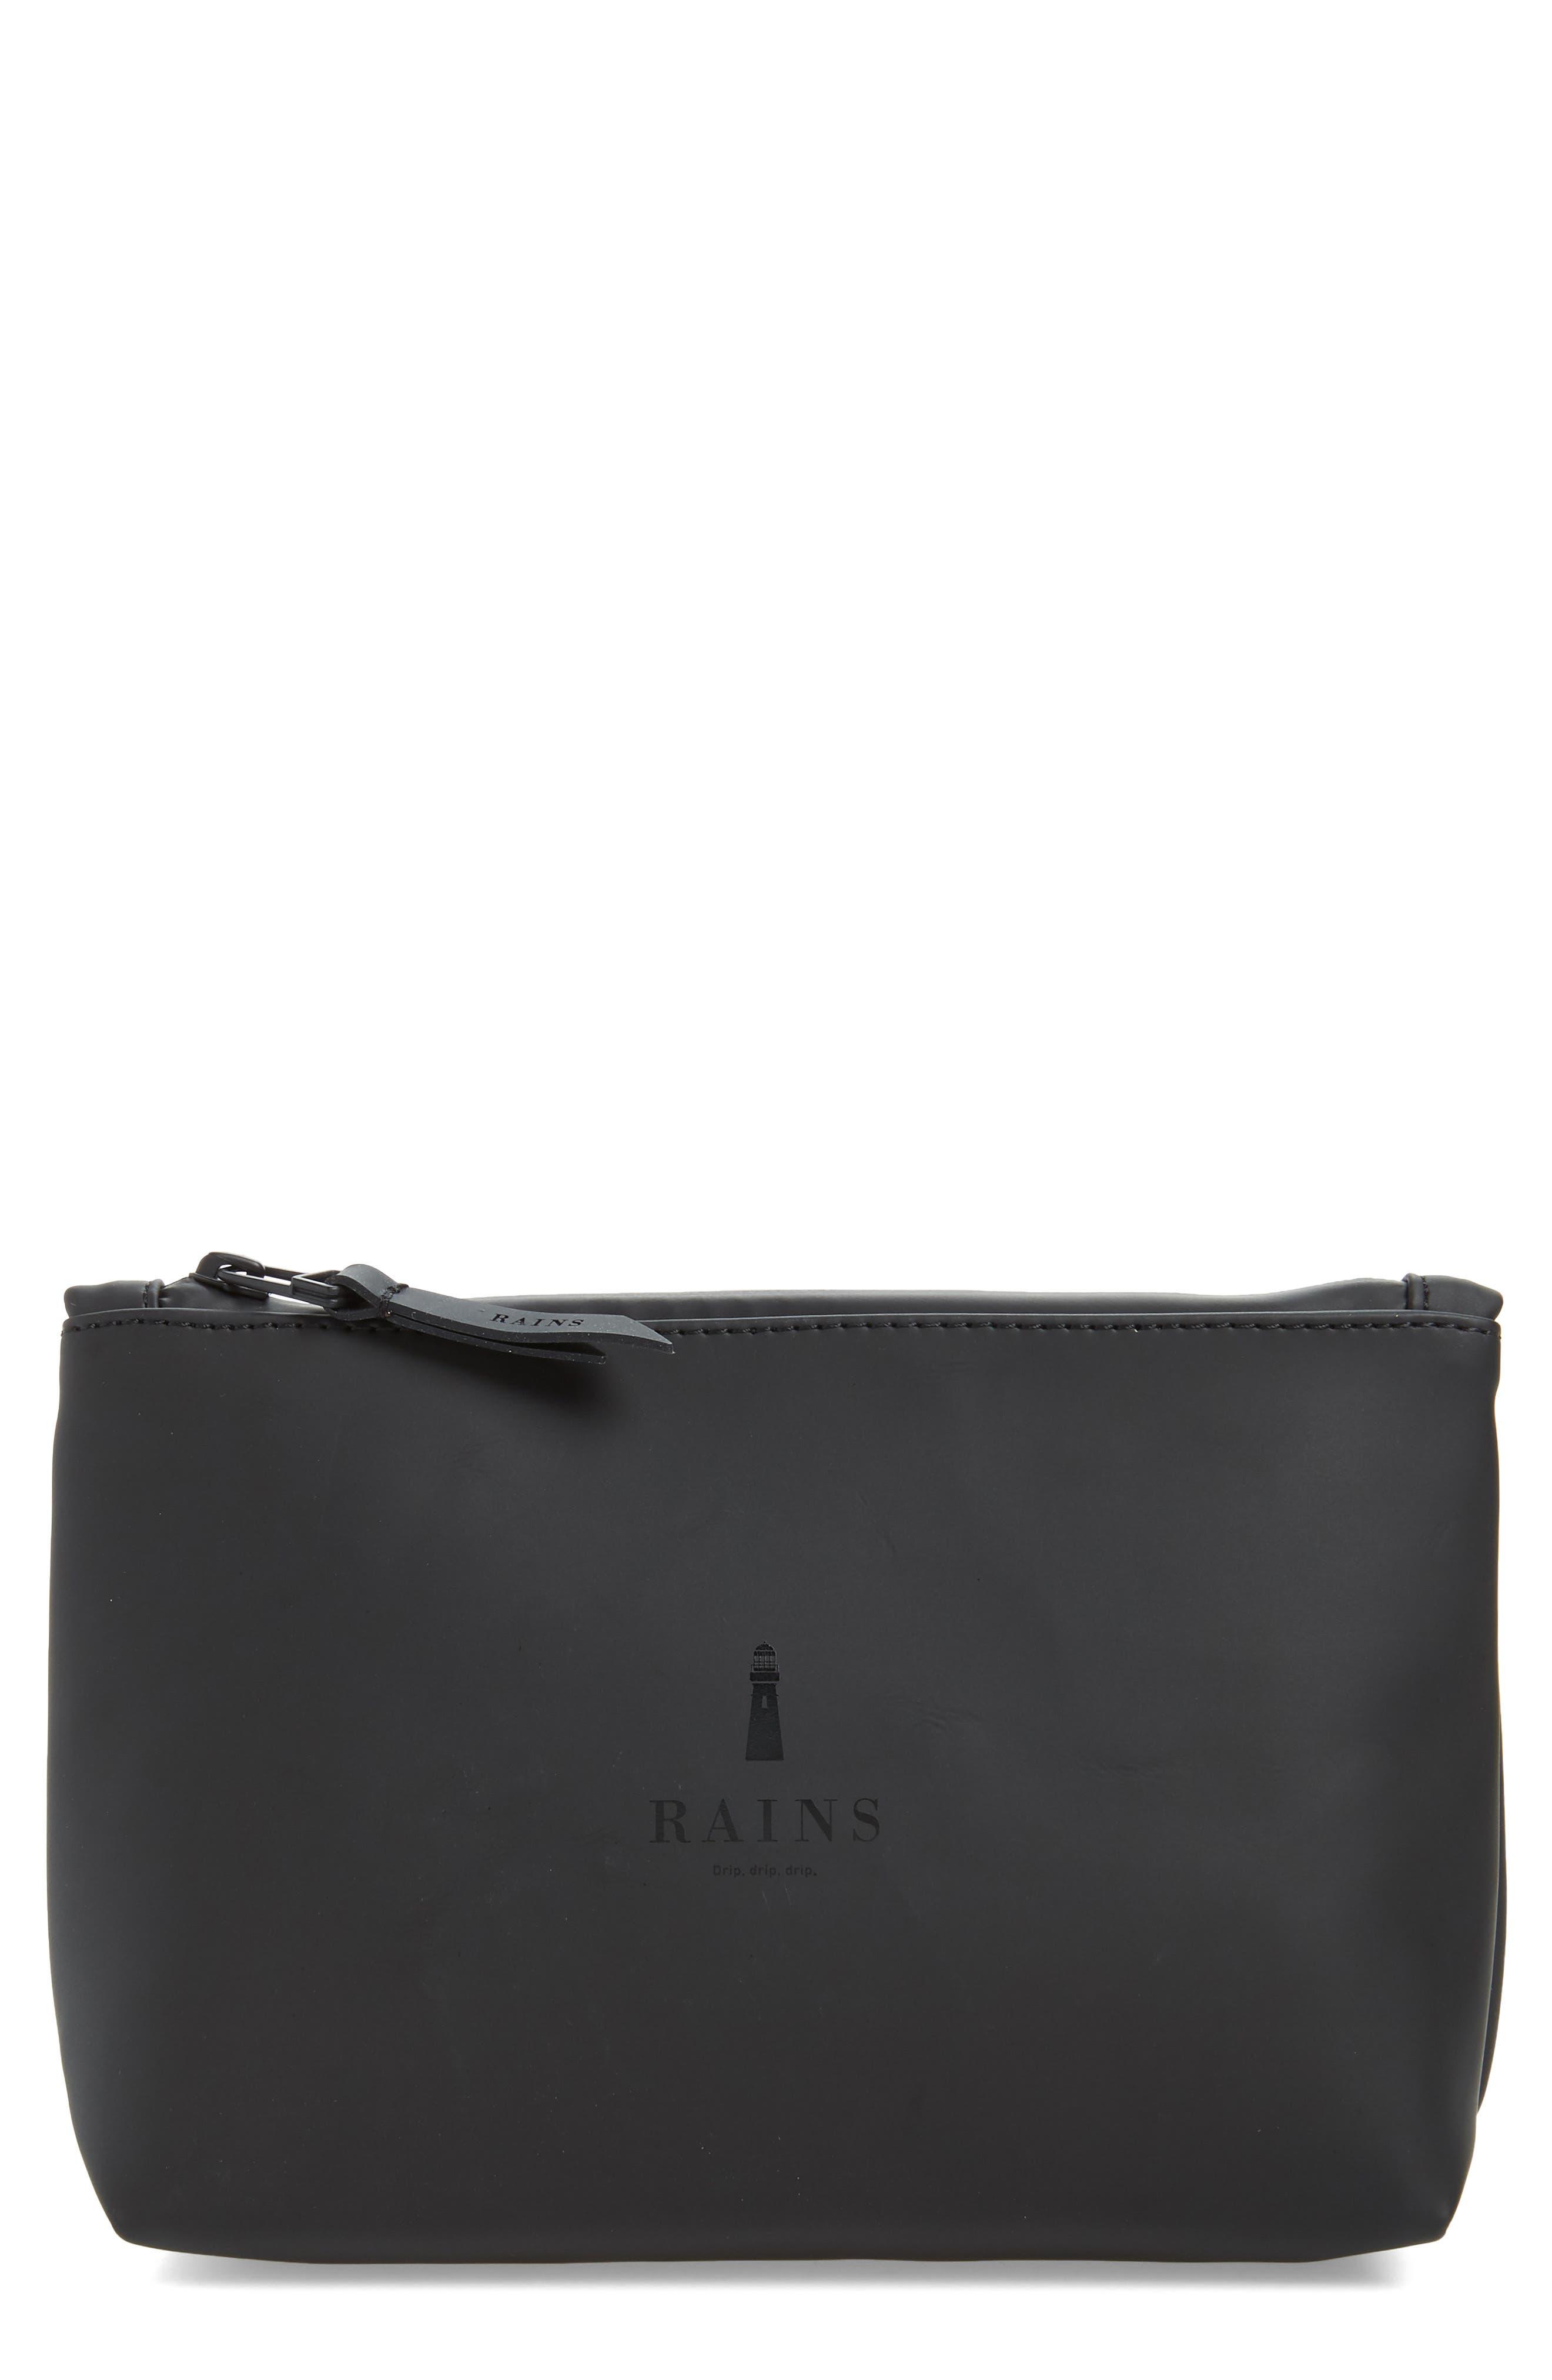 RAINS, Waterproof Cosmetics Bag, Main thumbnail 1, color, BLACK